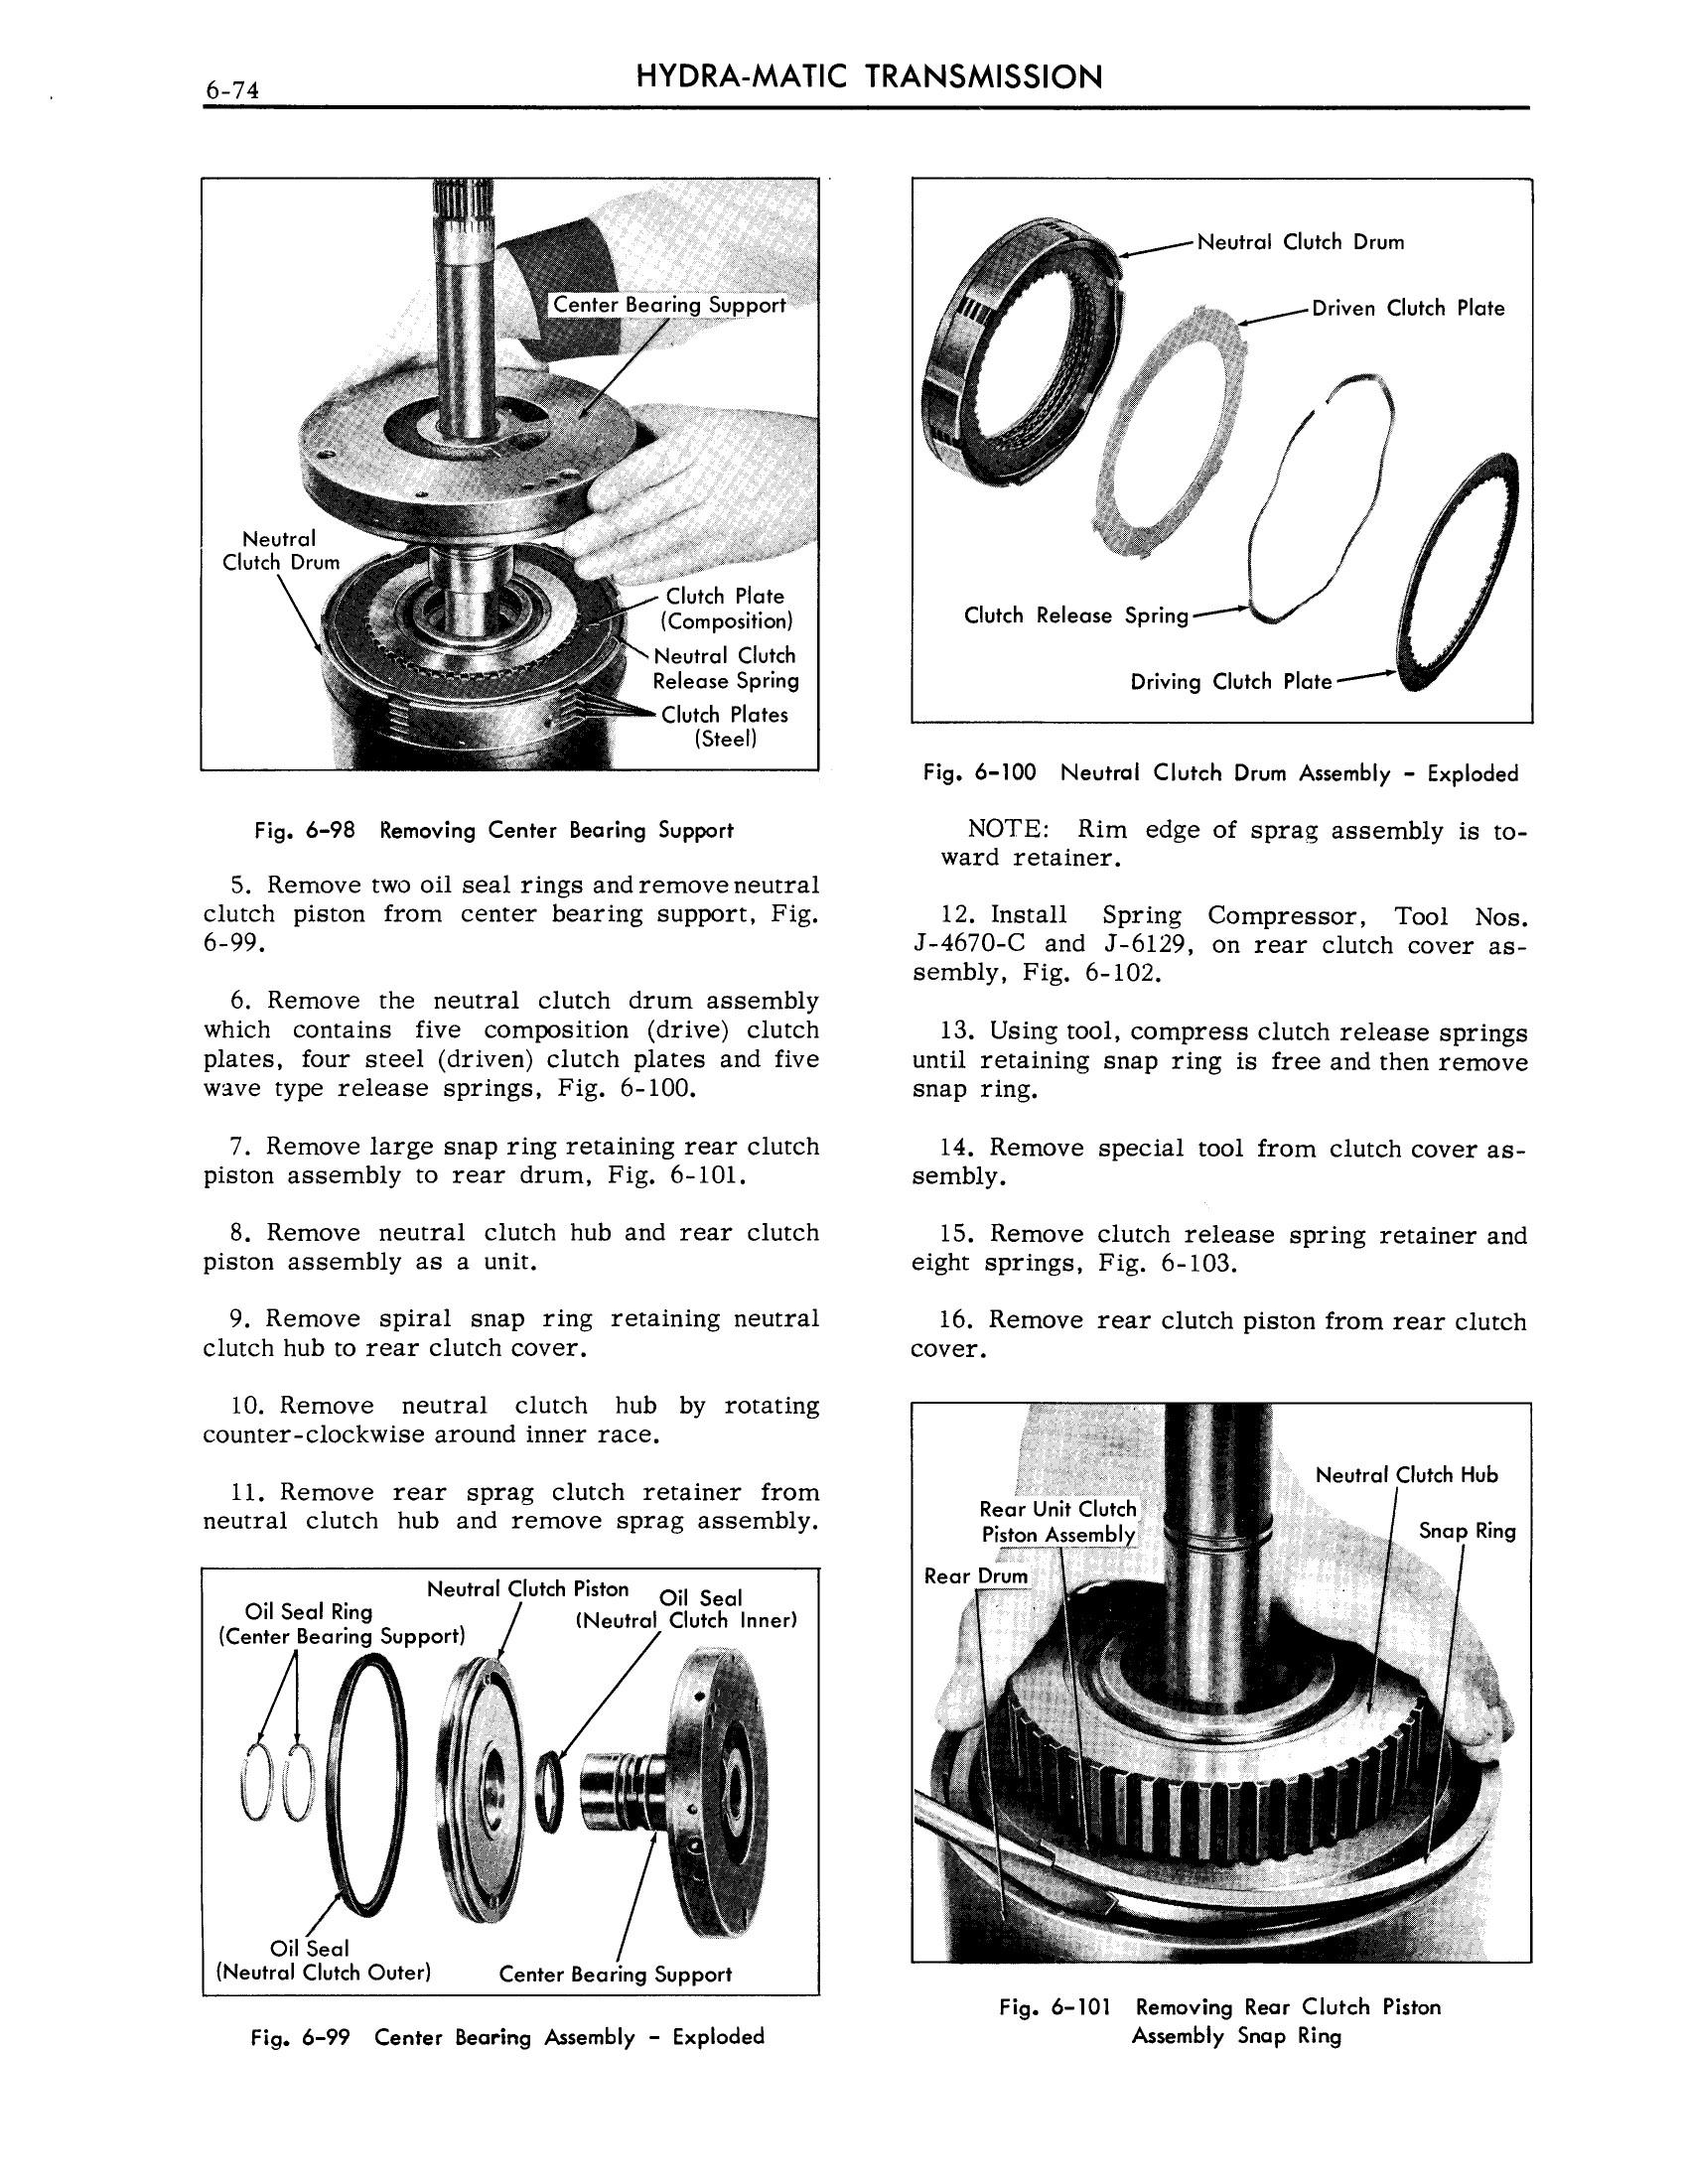 1959 Cadillac Shop Manual- Hydra-Matic Page 74 of 89